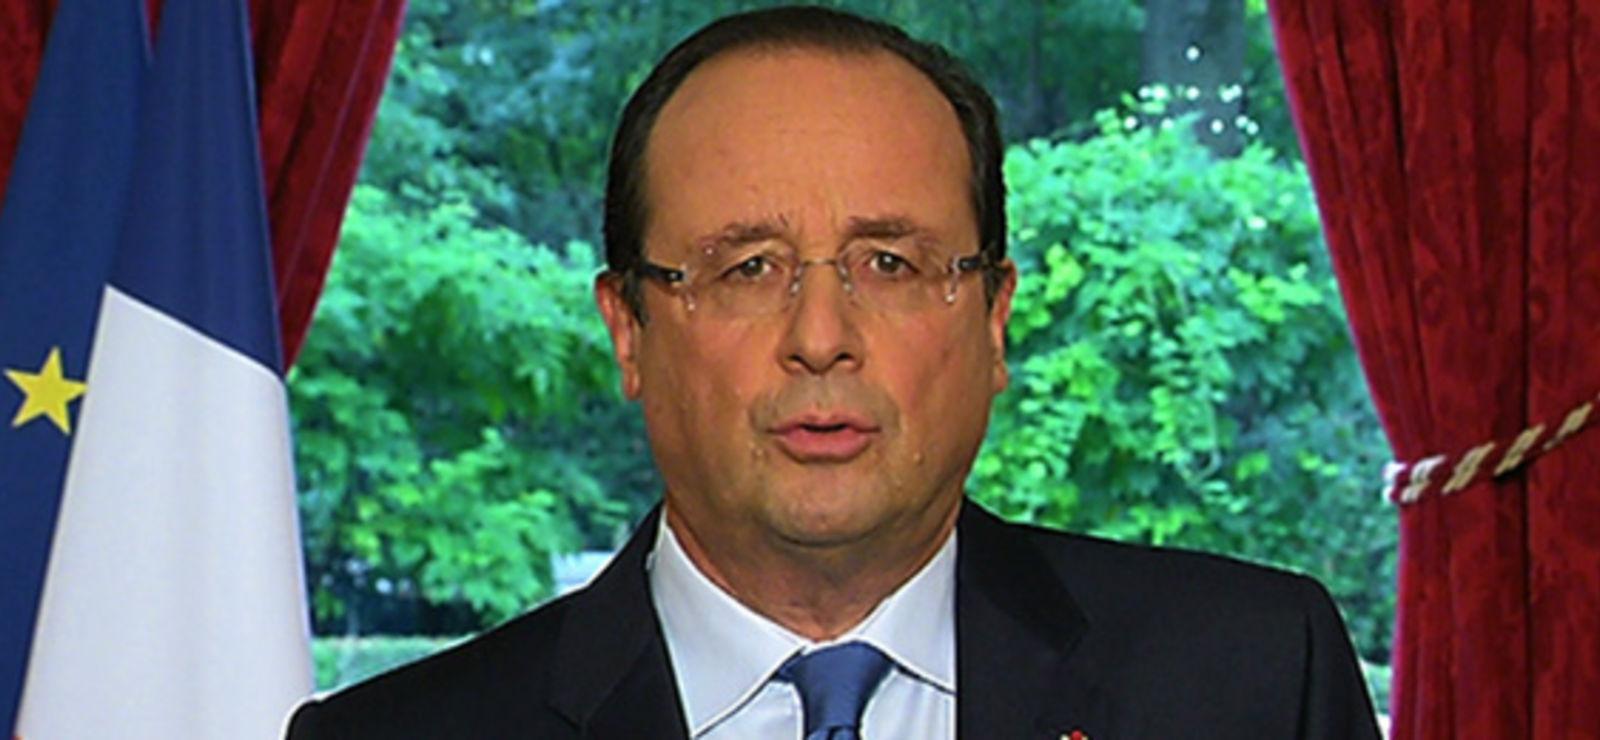 François Hollande, minable et odieux